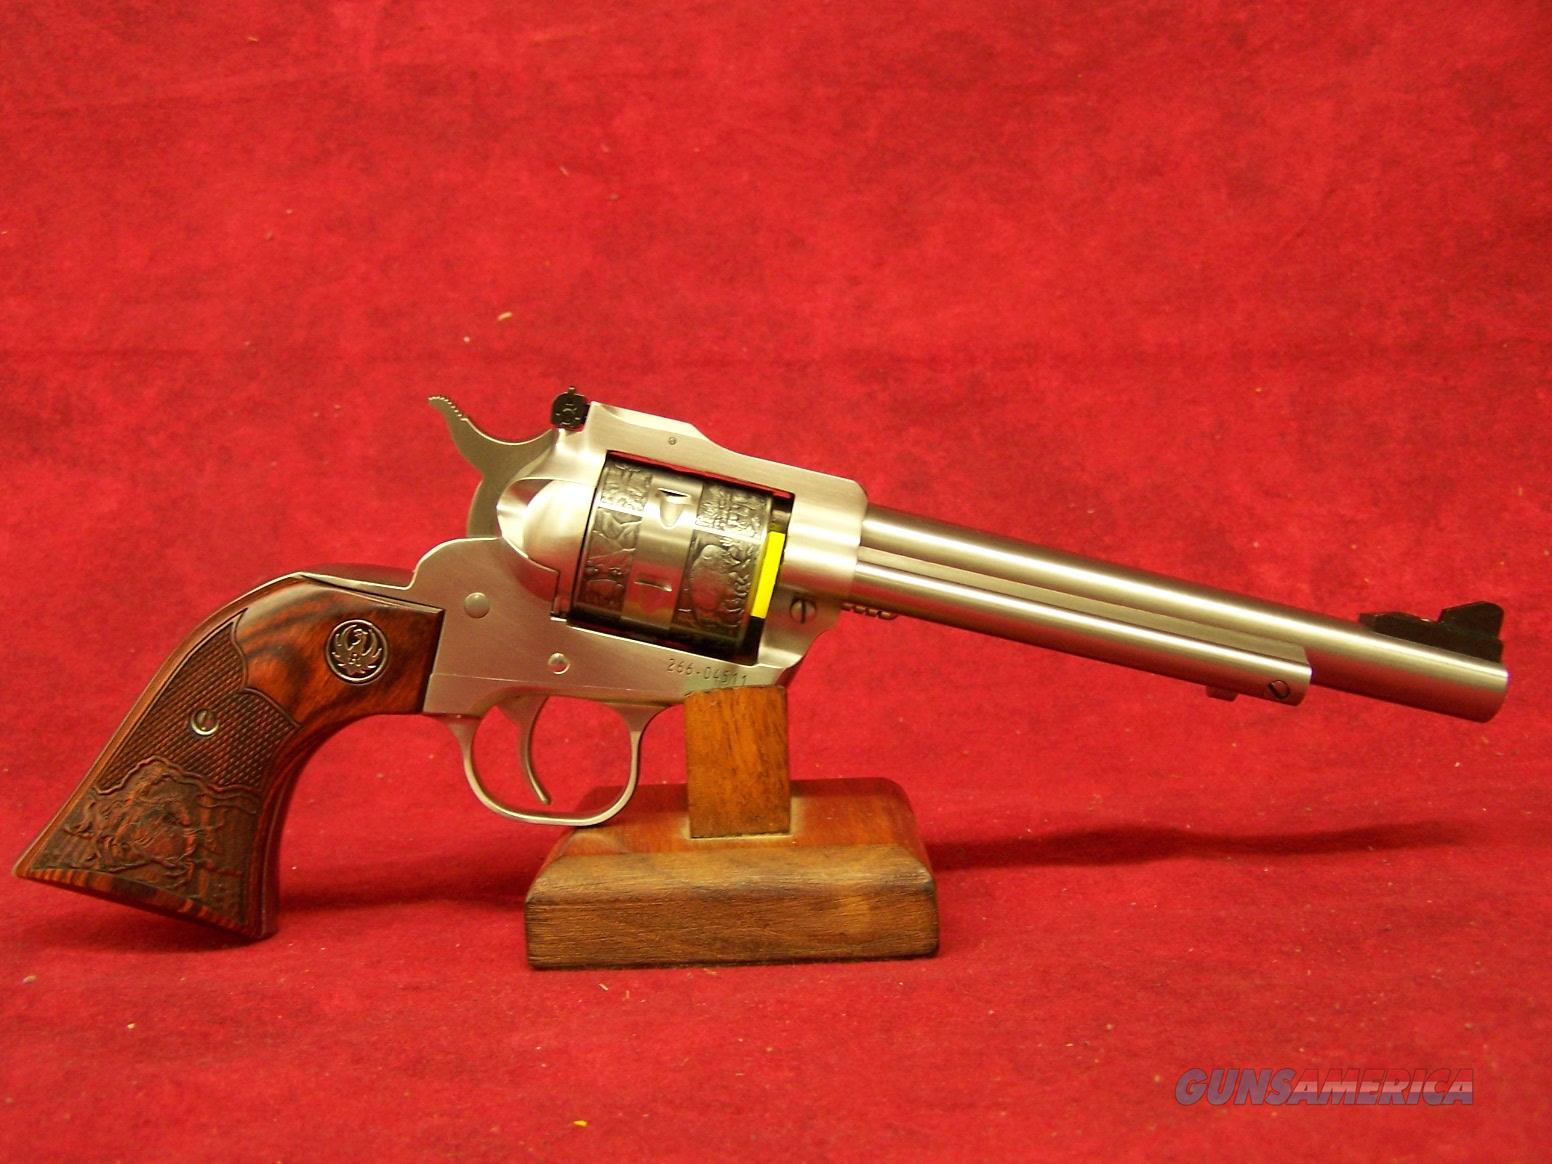 "Ruger Single Six Convertible Talo Engraved 22lr / 22 WMRF  6.5"" Barrel (00676)  Guns > Pistols > Ruger Single Action Revolvers > Single Six Type"